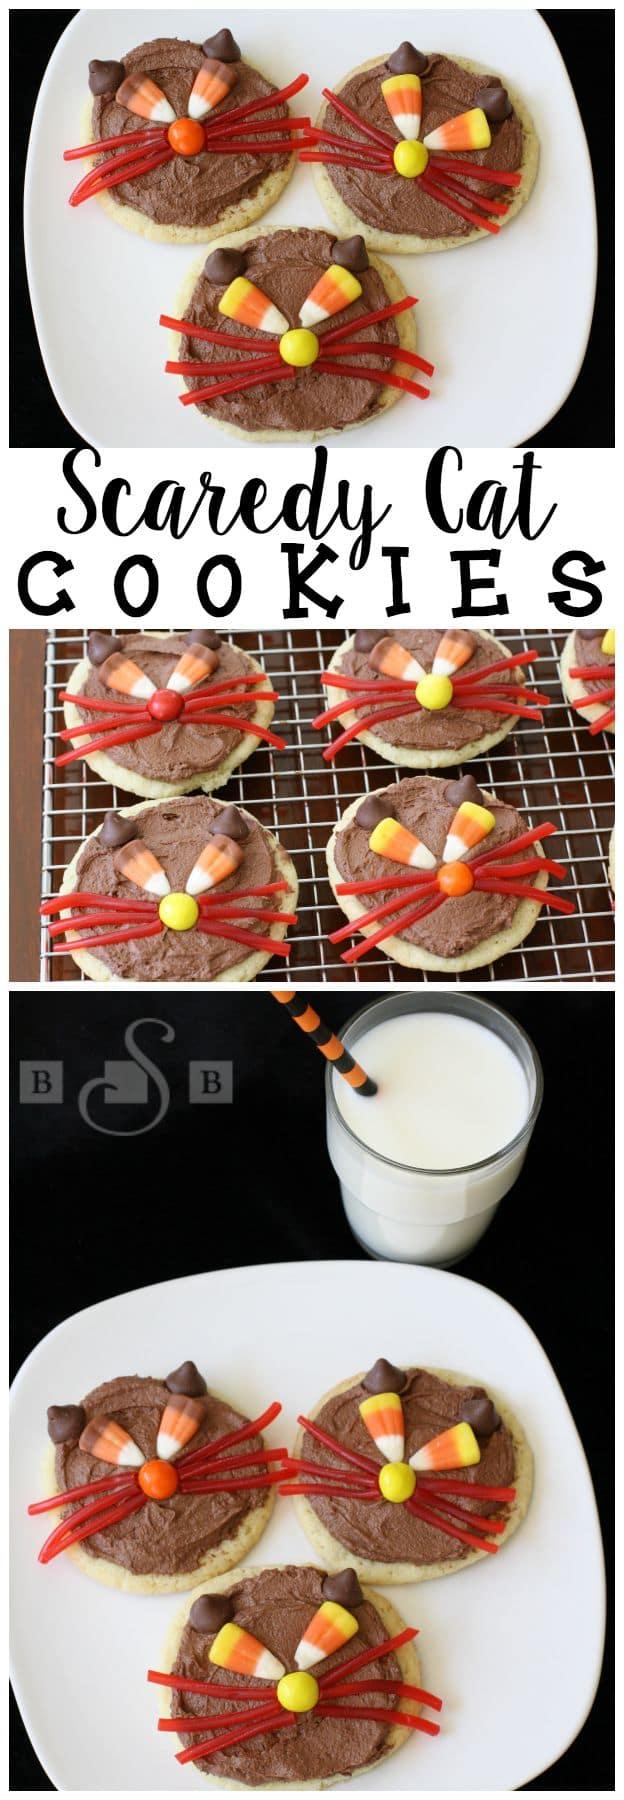 scaredy-cat-cookies-krusteaz-bsb_-pin_